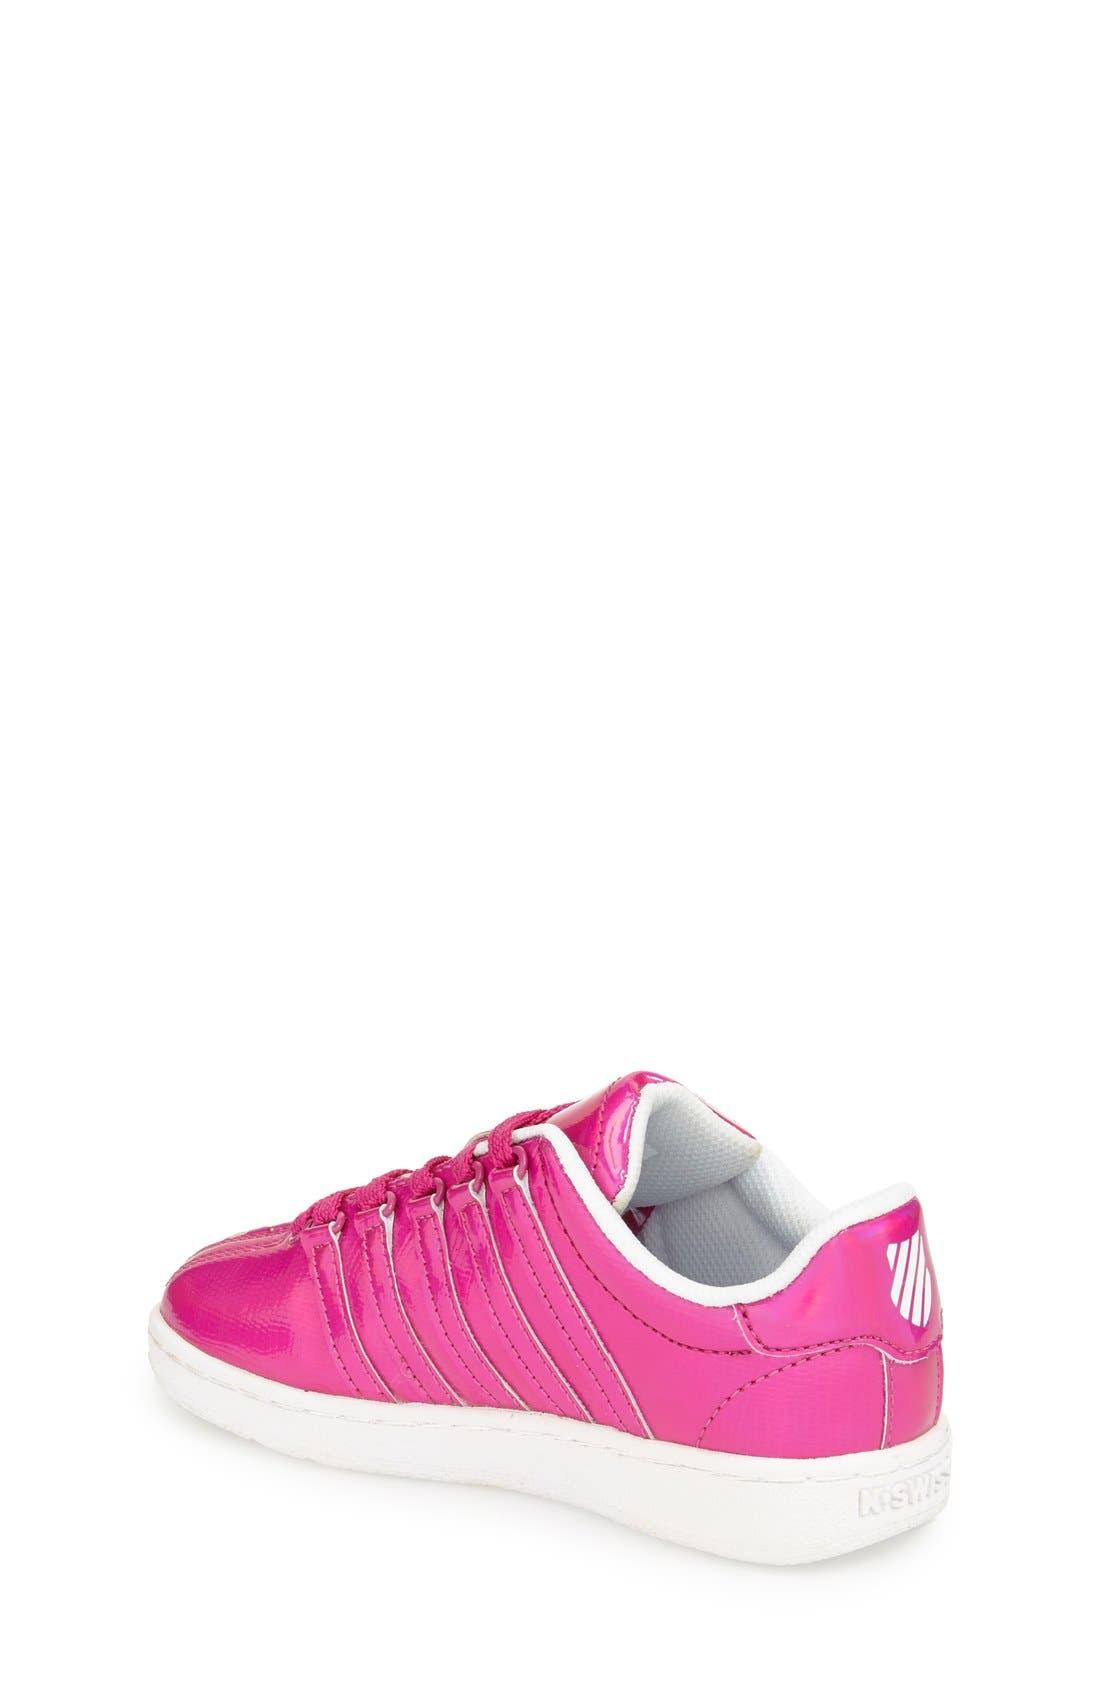 'Classic - Shine On' Sneaker,                             Alternate thumbnail 2, color,                             Pink/ White